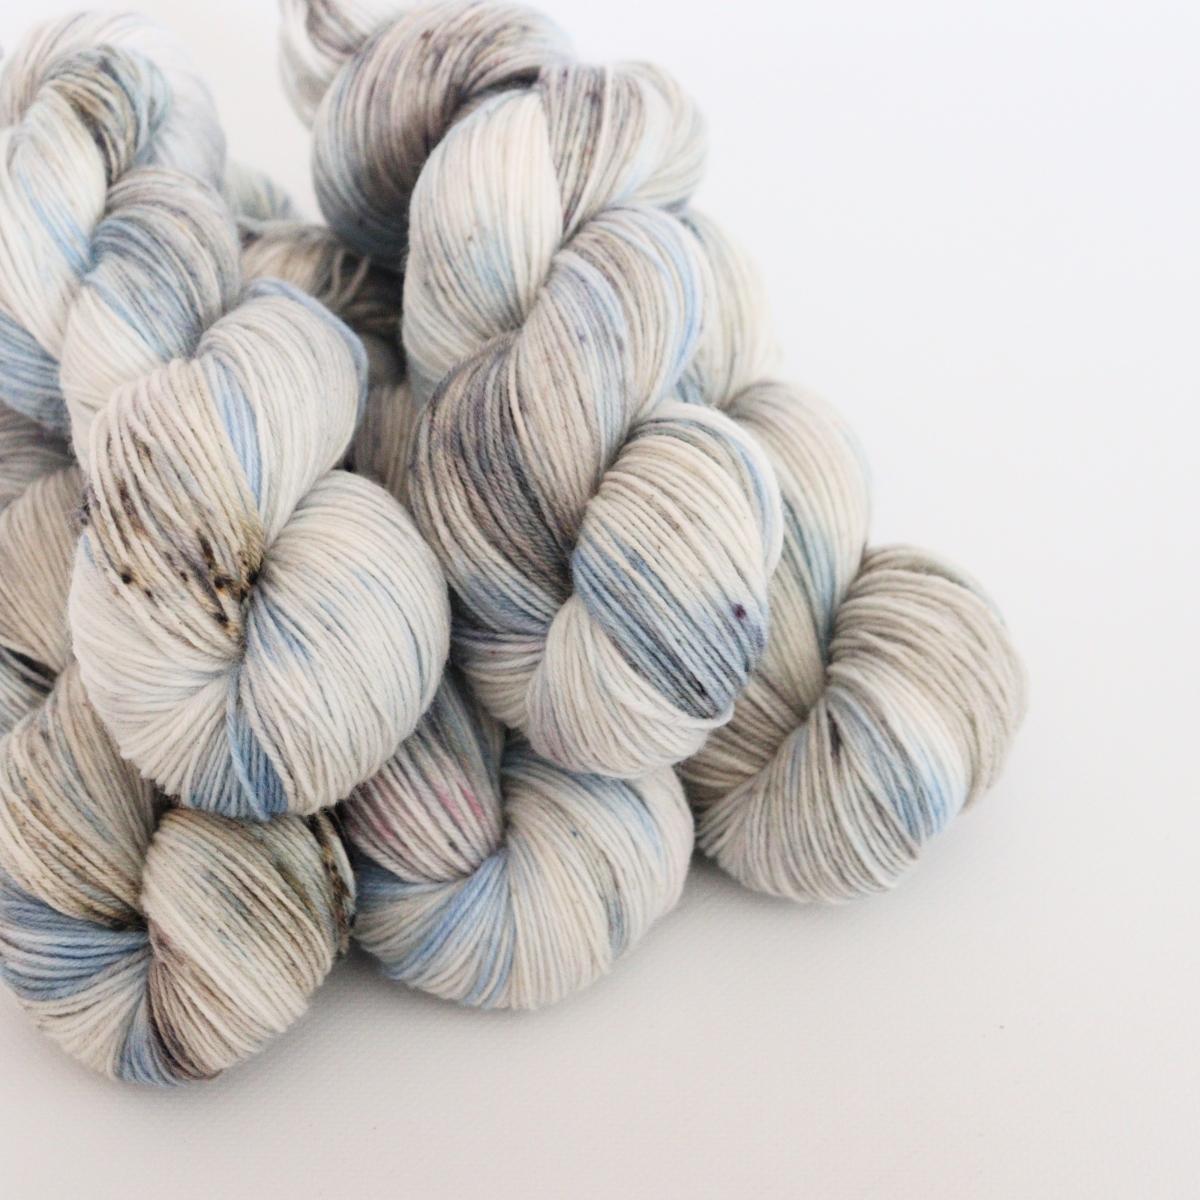 woodico.pro hand dyed yarn 063 2 1200x1200 - Hand dyed yarn / 063